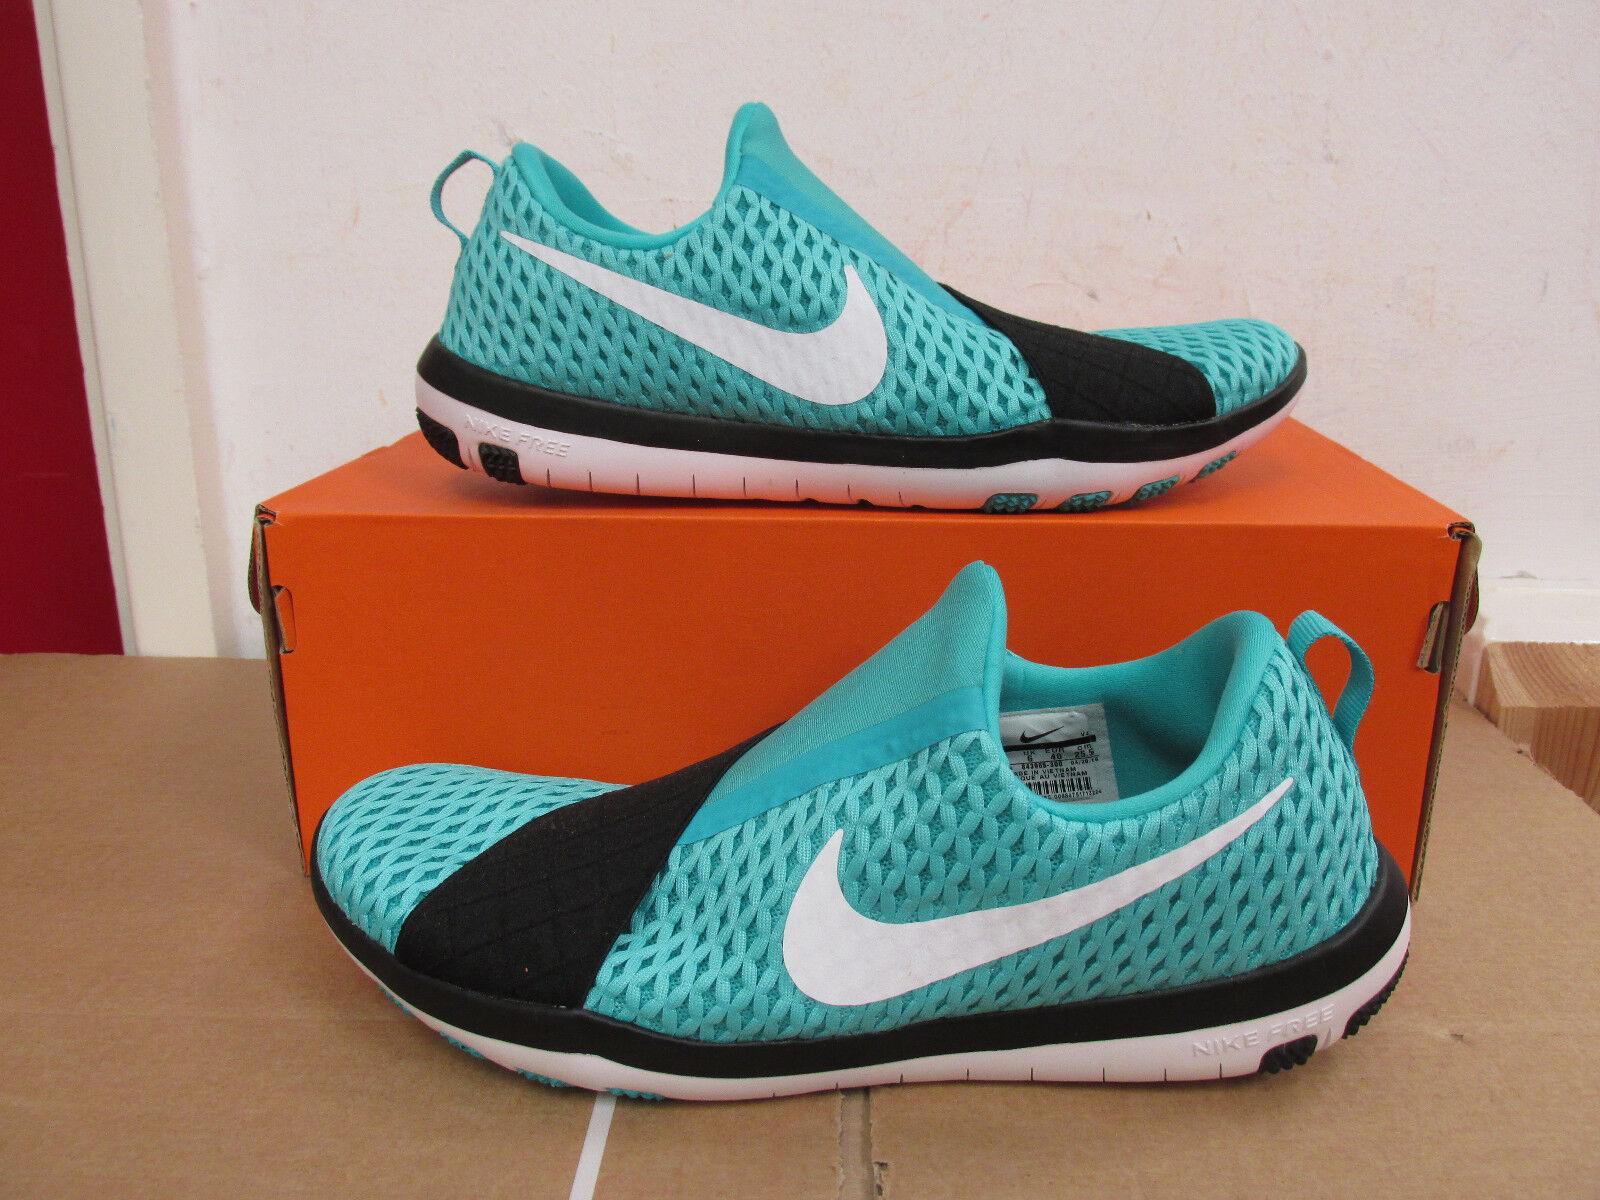 Nike da Donna Gratis Connect Scarpe Corsa 843966 300 Ginnastica Shoess Svendita